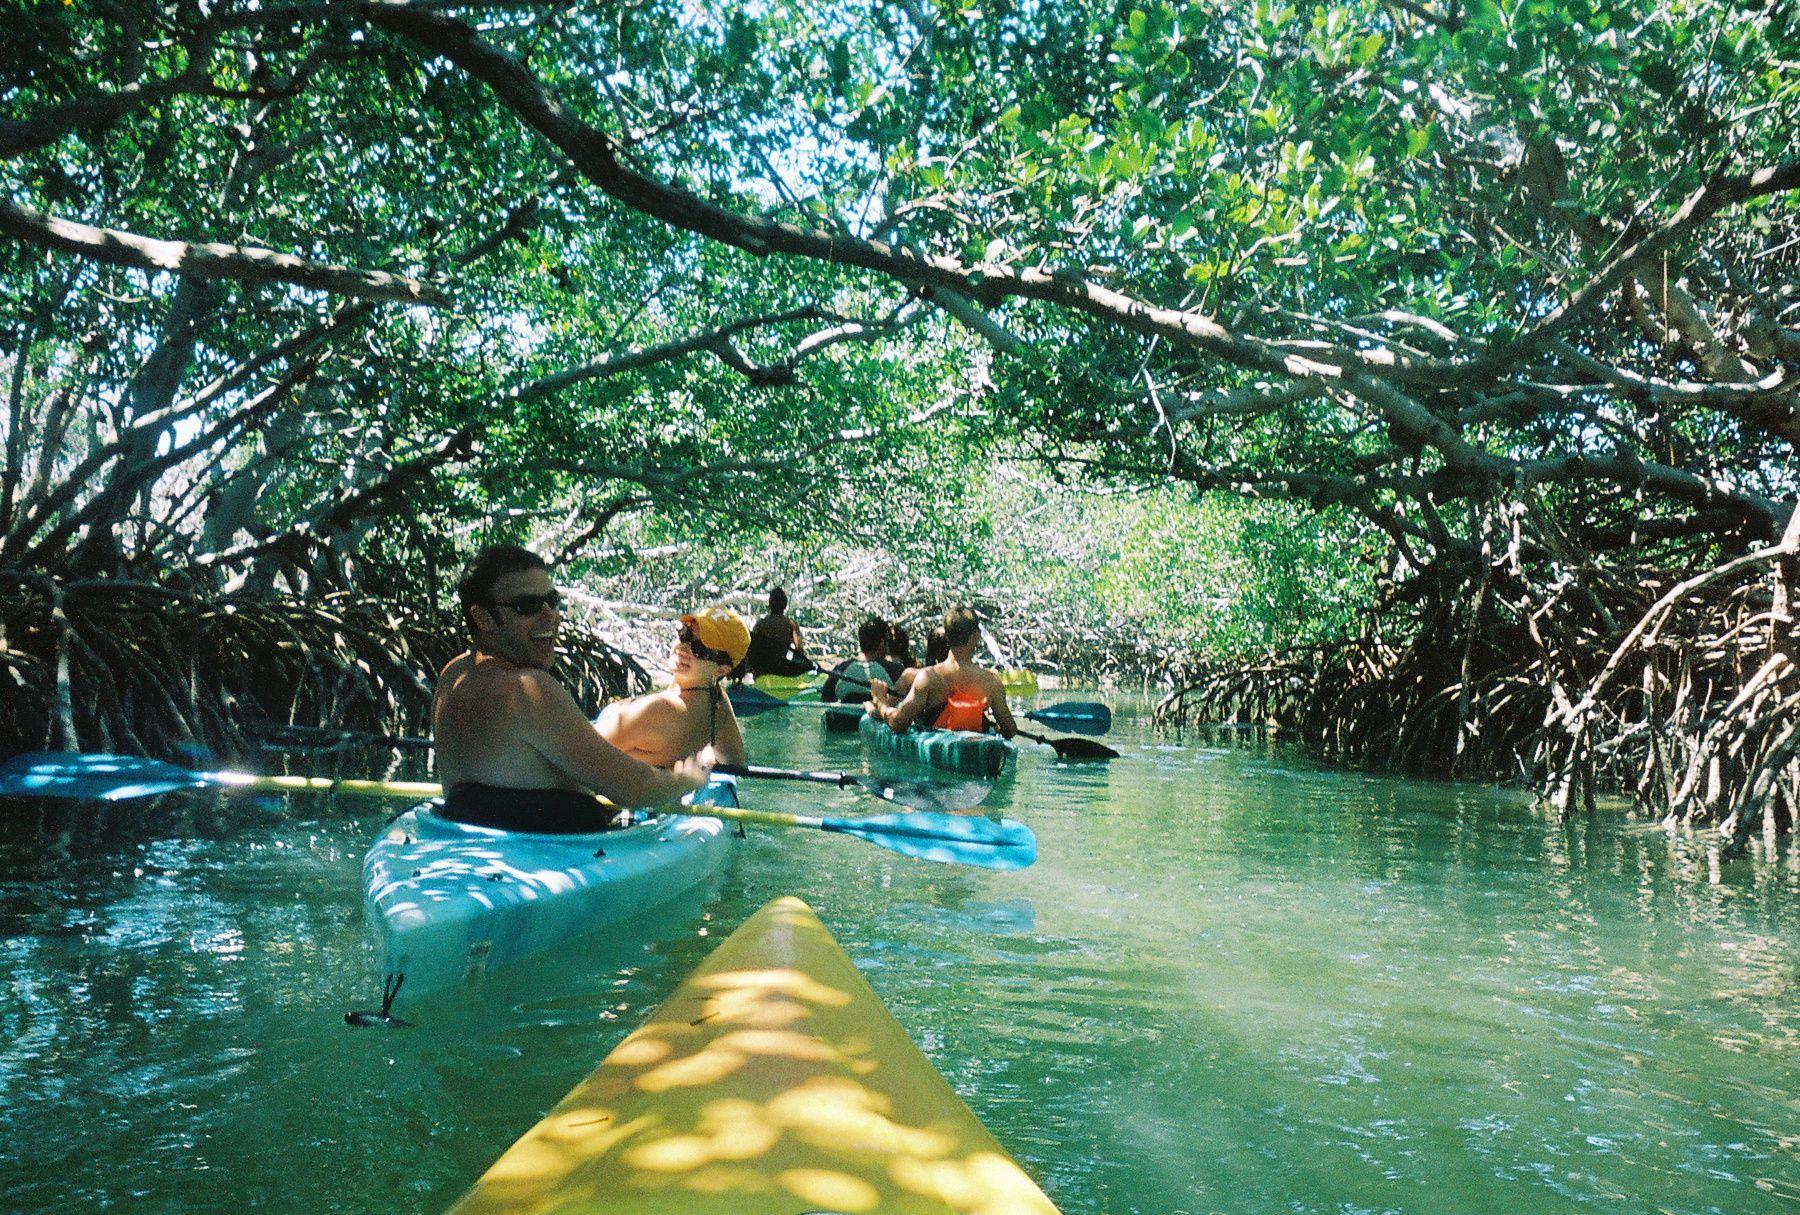 kayaking through mangrove trees key west fl very cool will